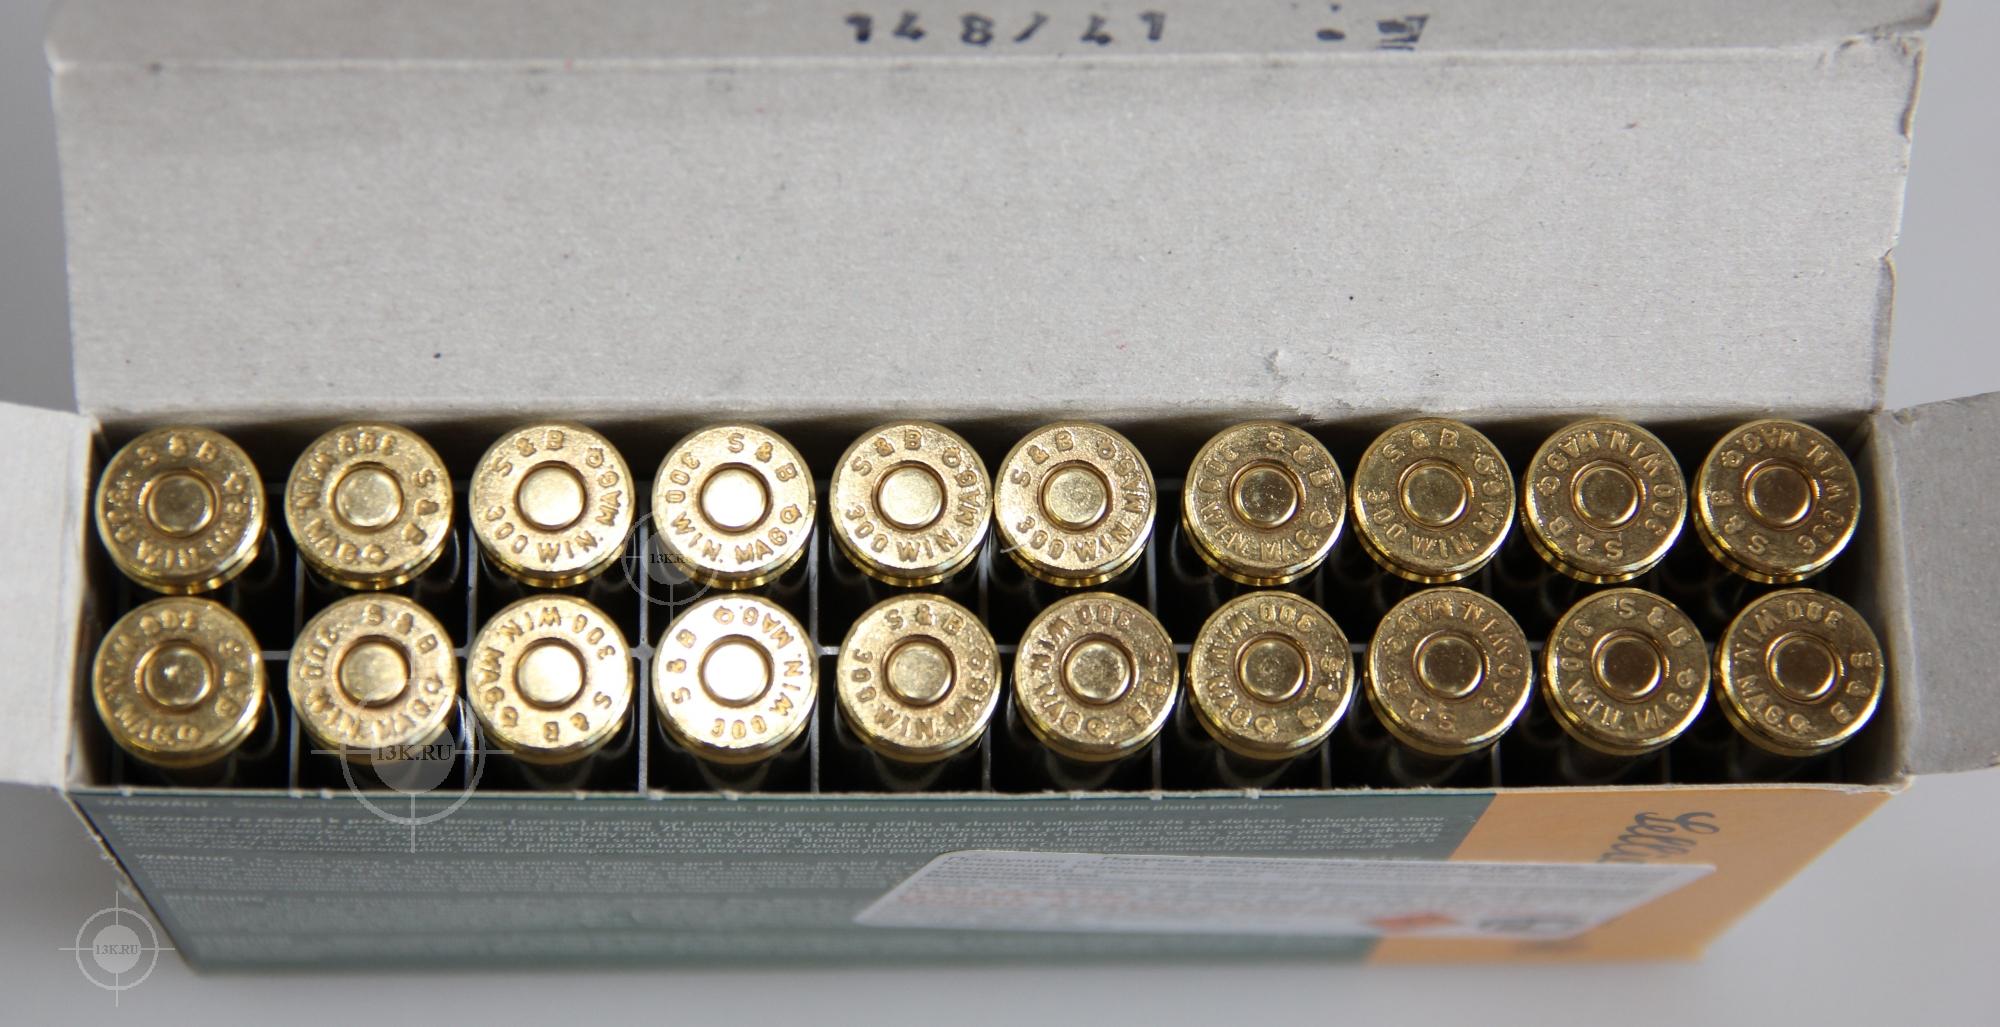 Sellier bellot 7 62x39 sp вес 8 гр 20 шт 2943